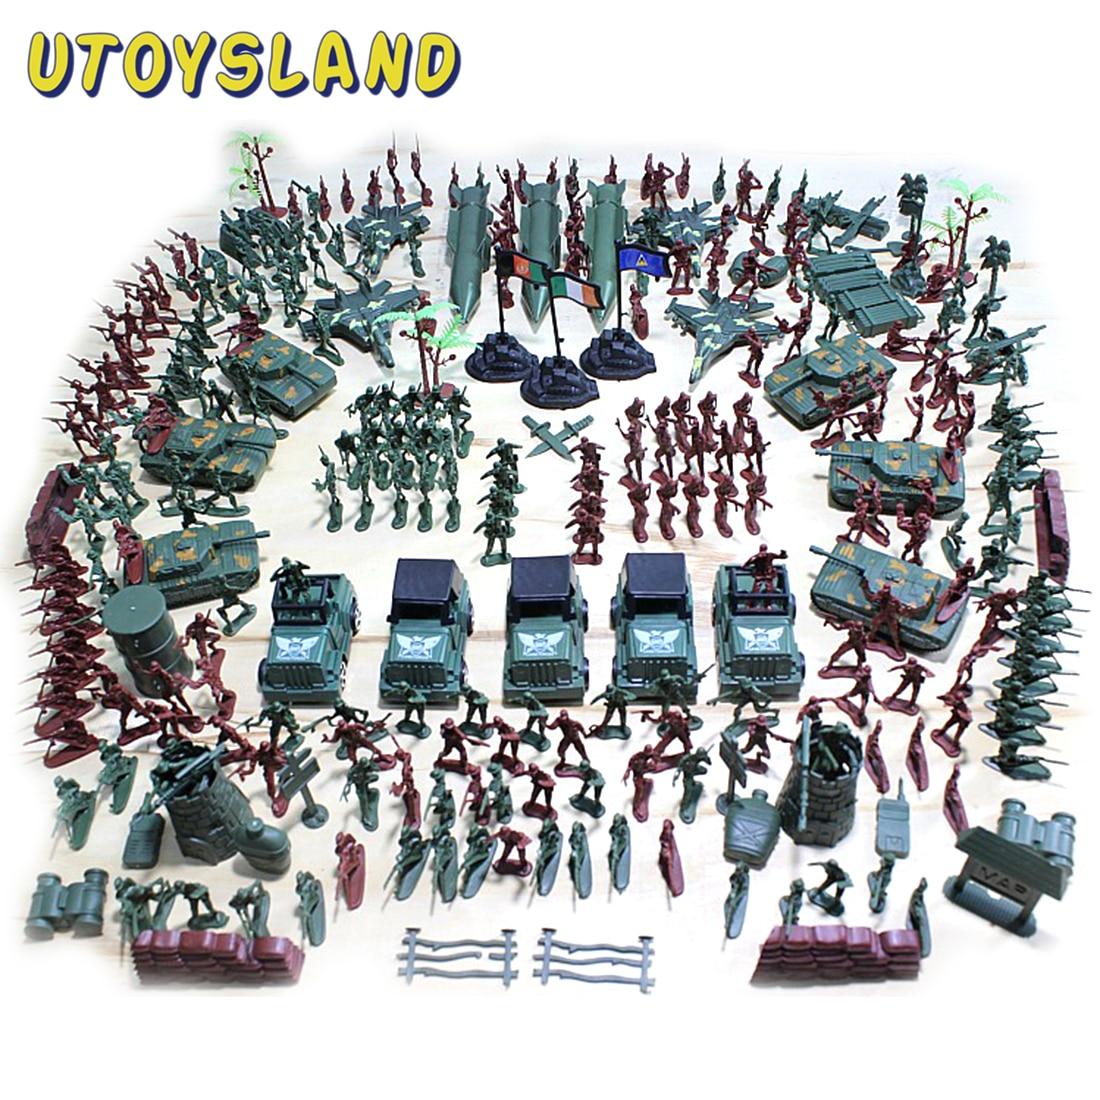 301Pcs 5cm Plastic Soldier Model World War II Soldier Military Toy Set For Children